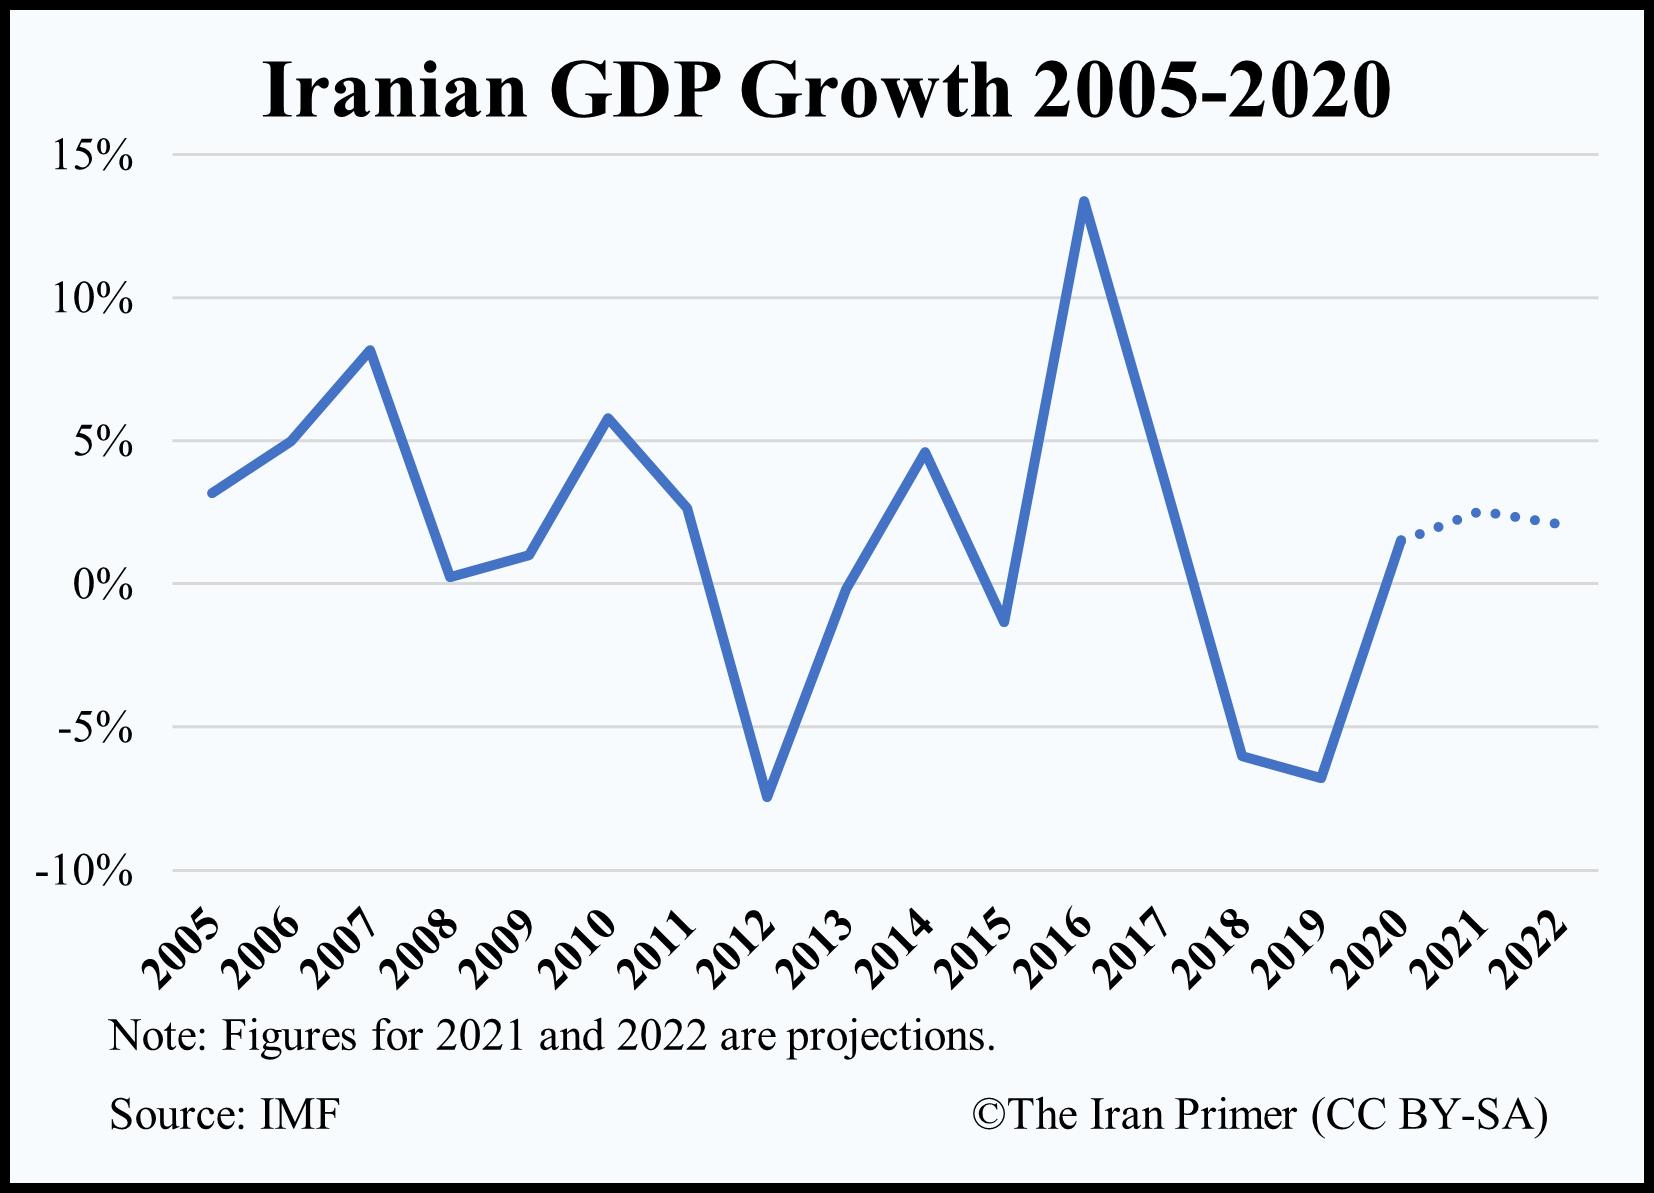 IMF GDP